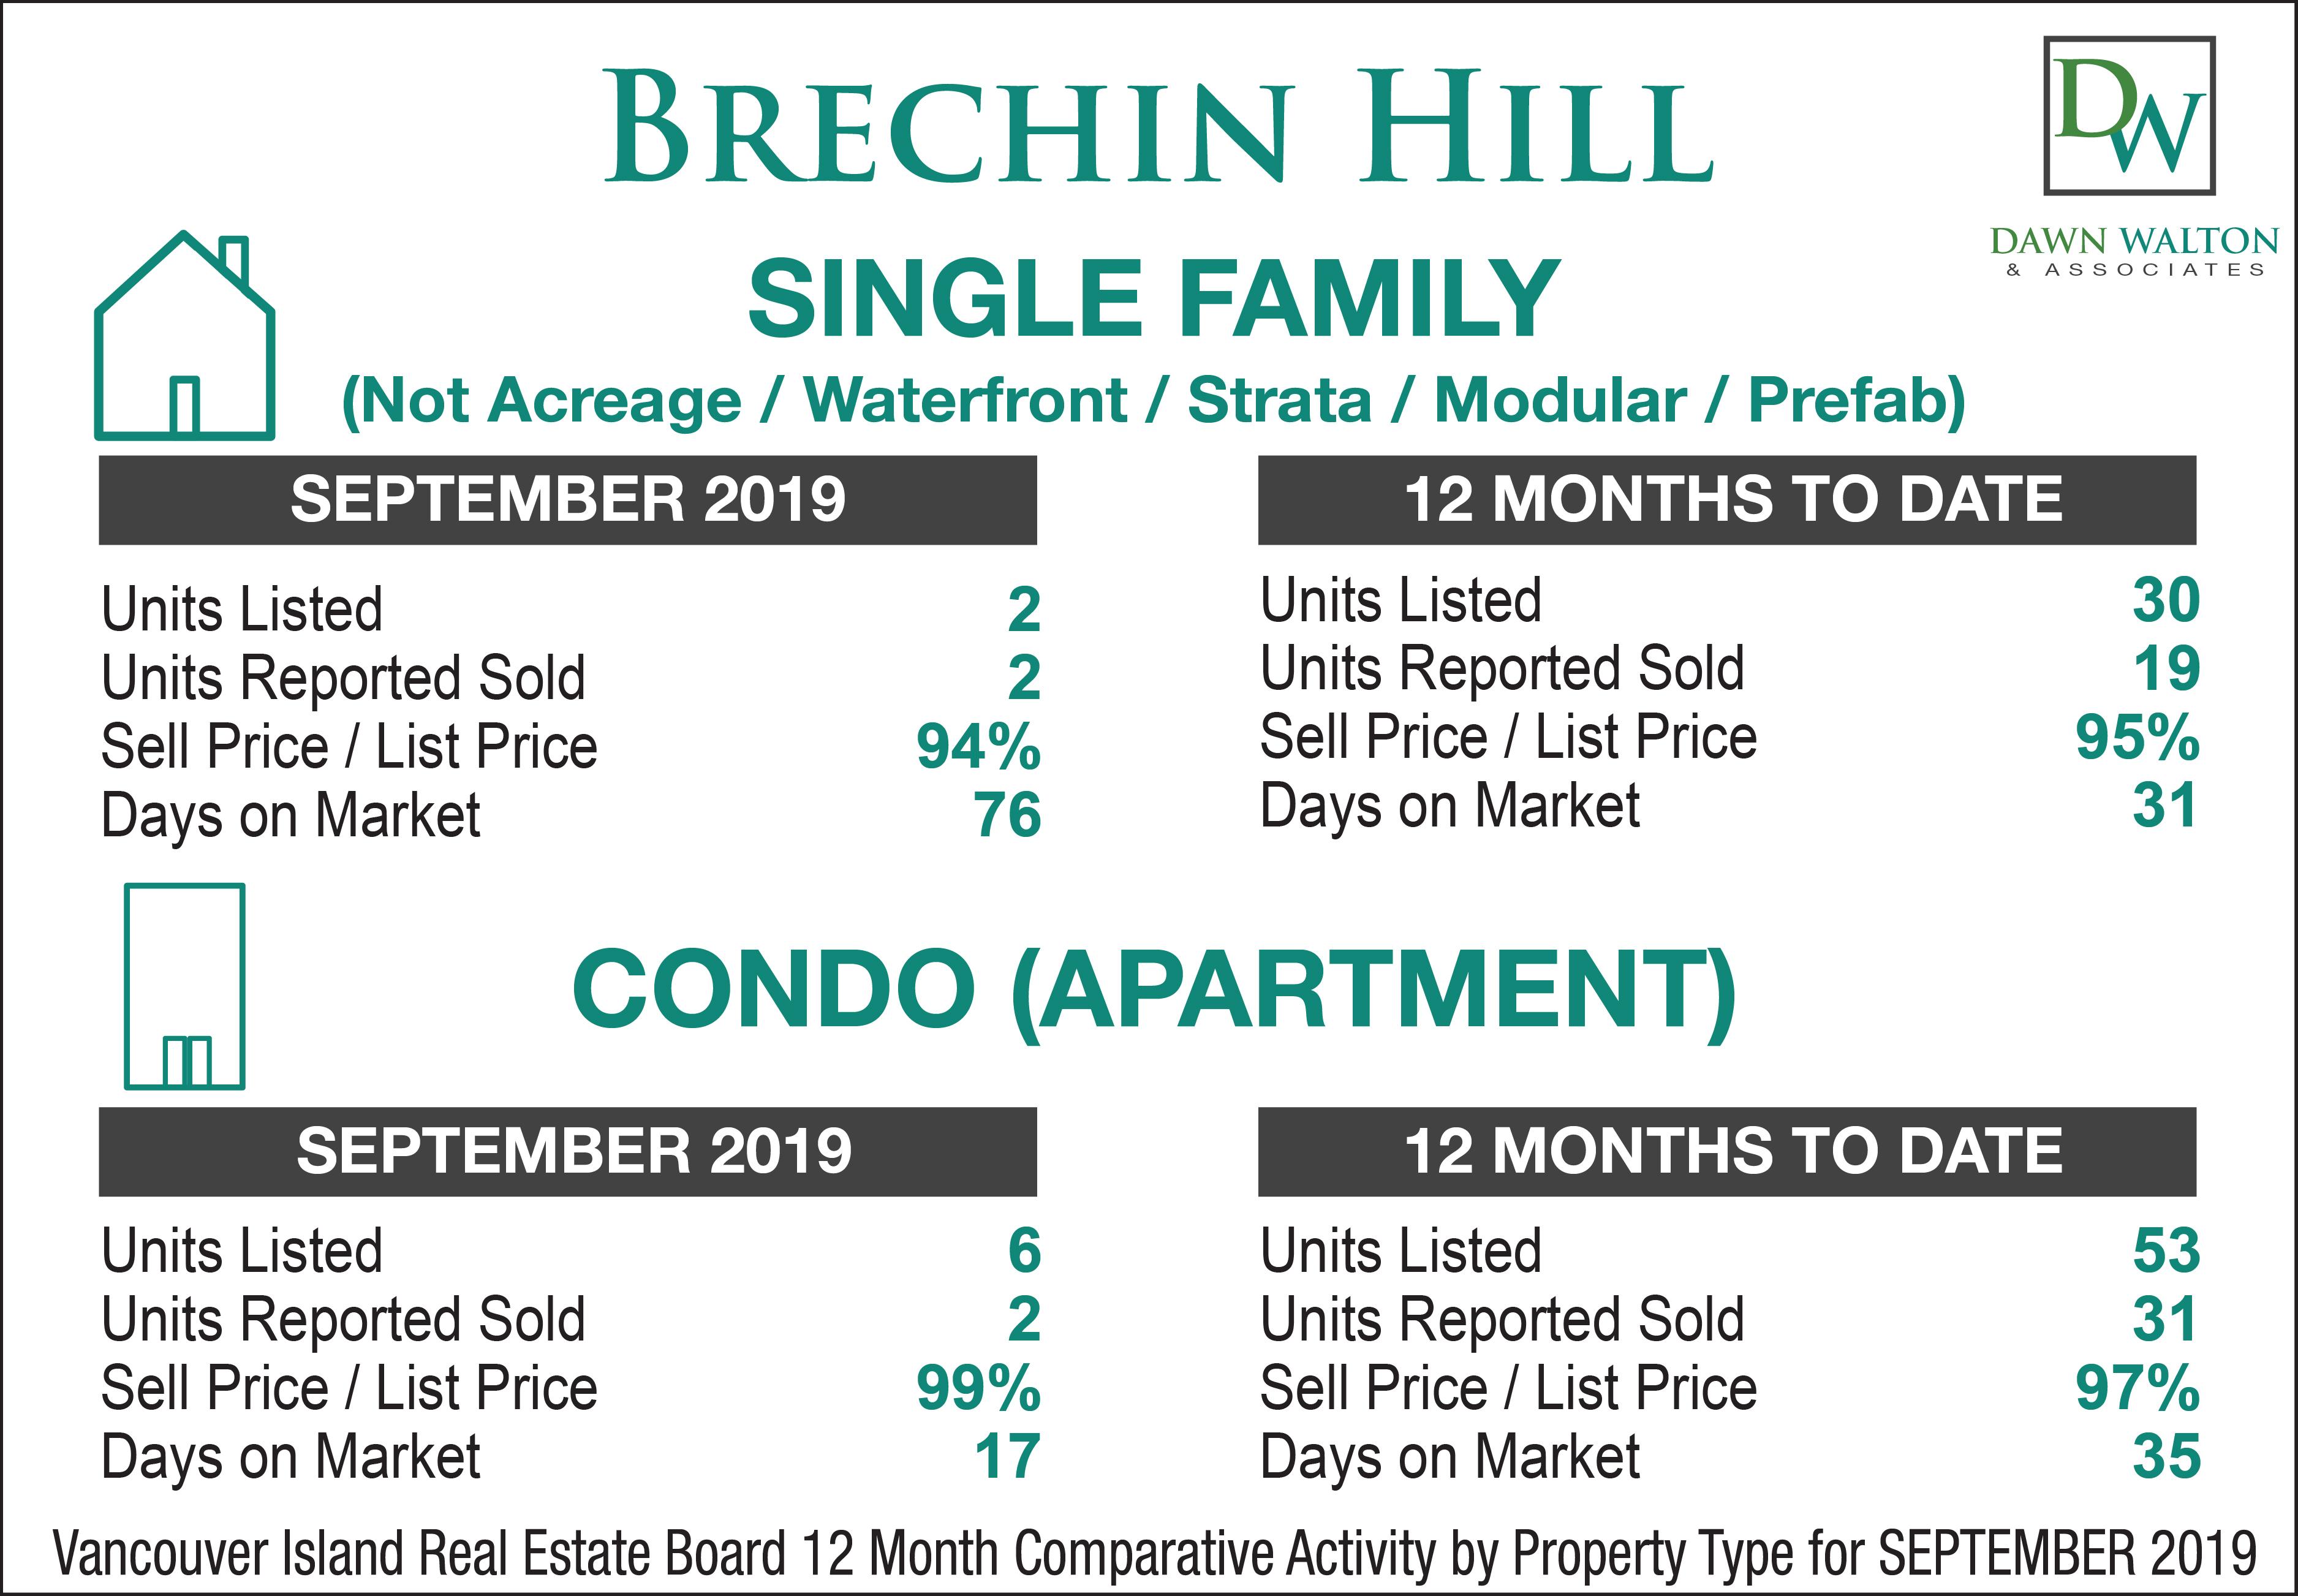 Brechin Hill Real Estate Market Stats September 2019 - Nanaimo Realtor Dawn Walton